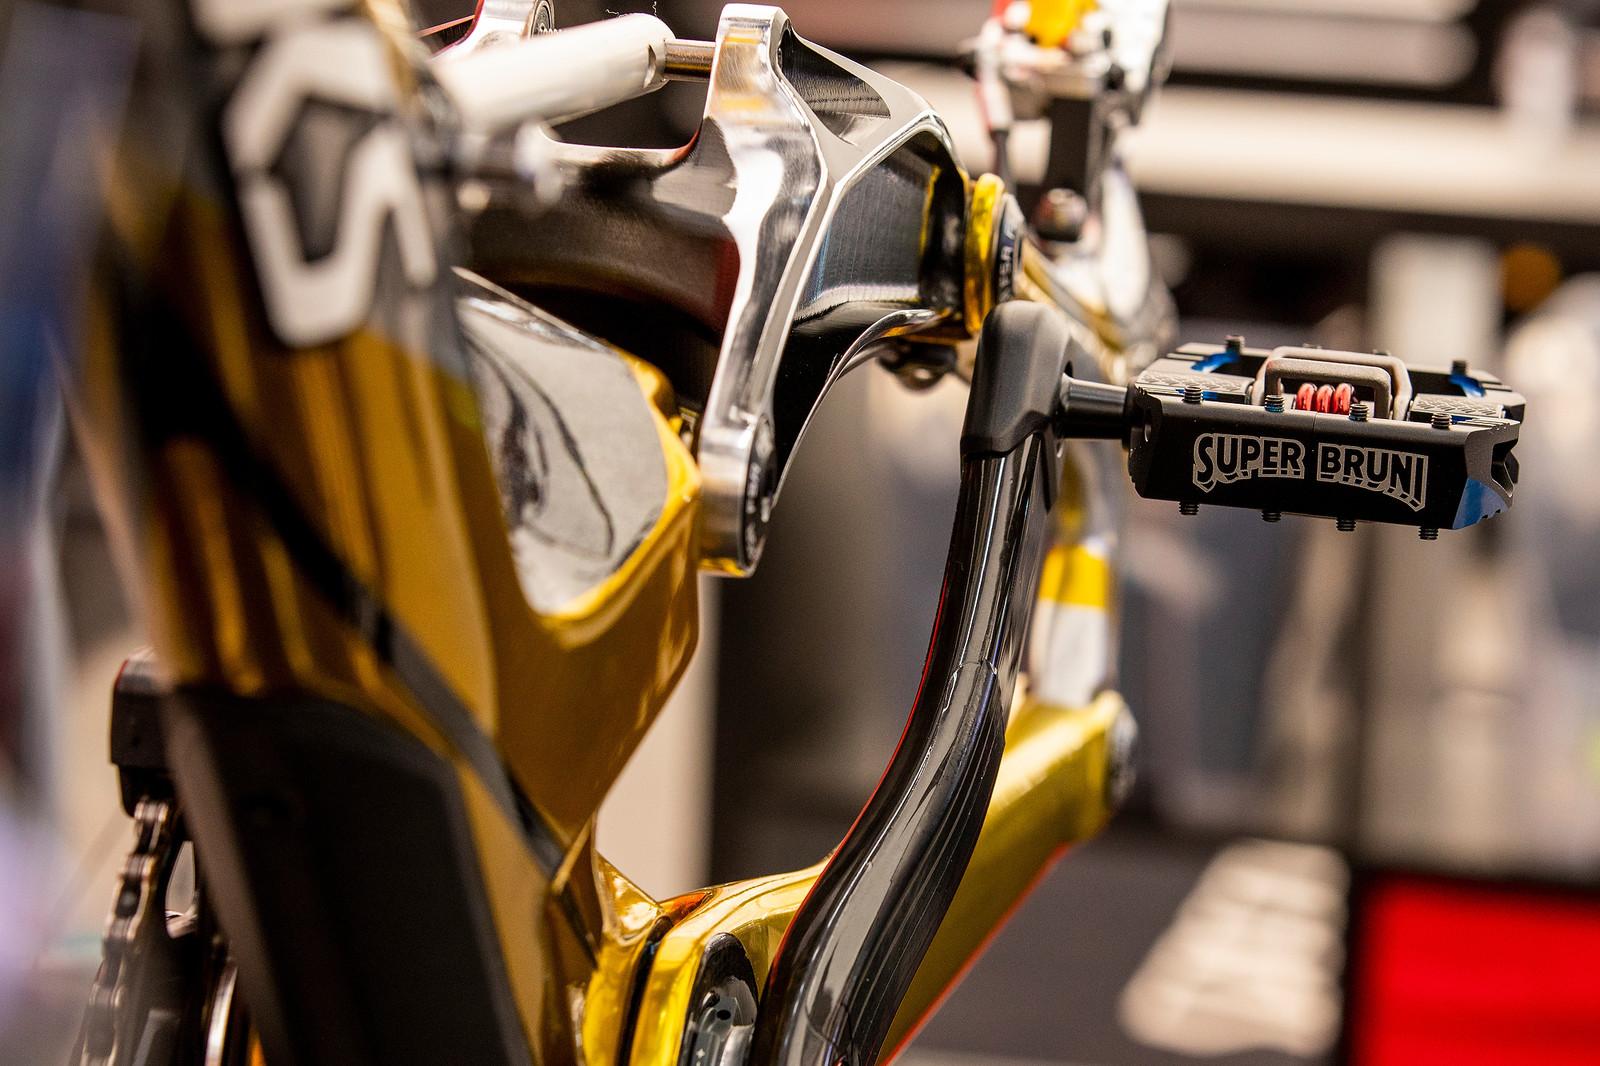 Super Bruni - WORLD CHAMPS BIKE - Loic Bruni's Specialized Demo - Mountain Biking Pictures - Vital MTB